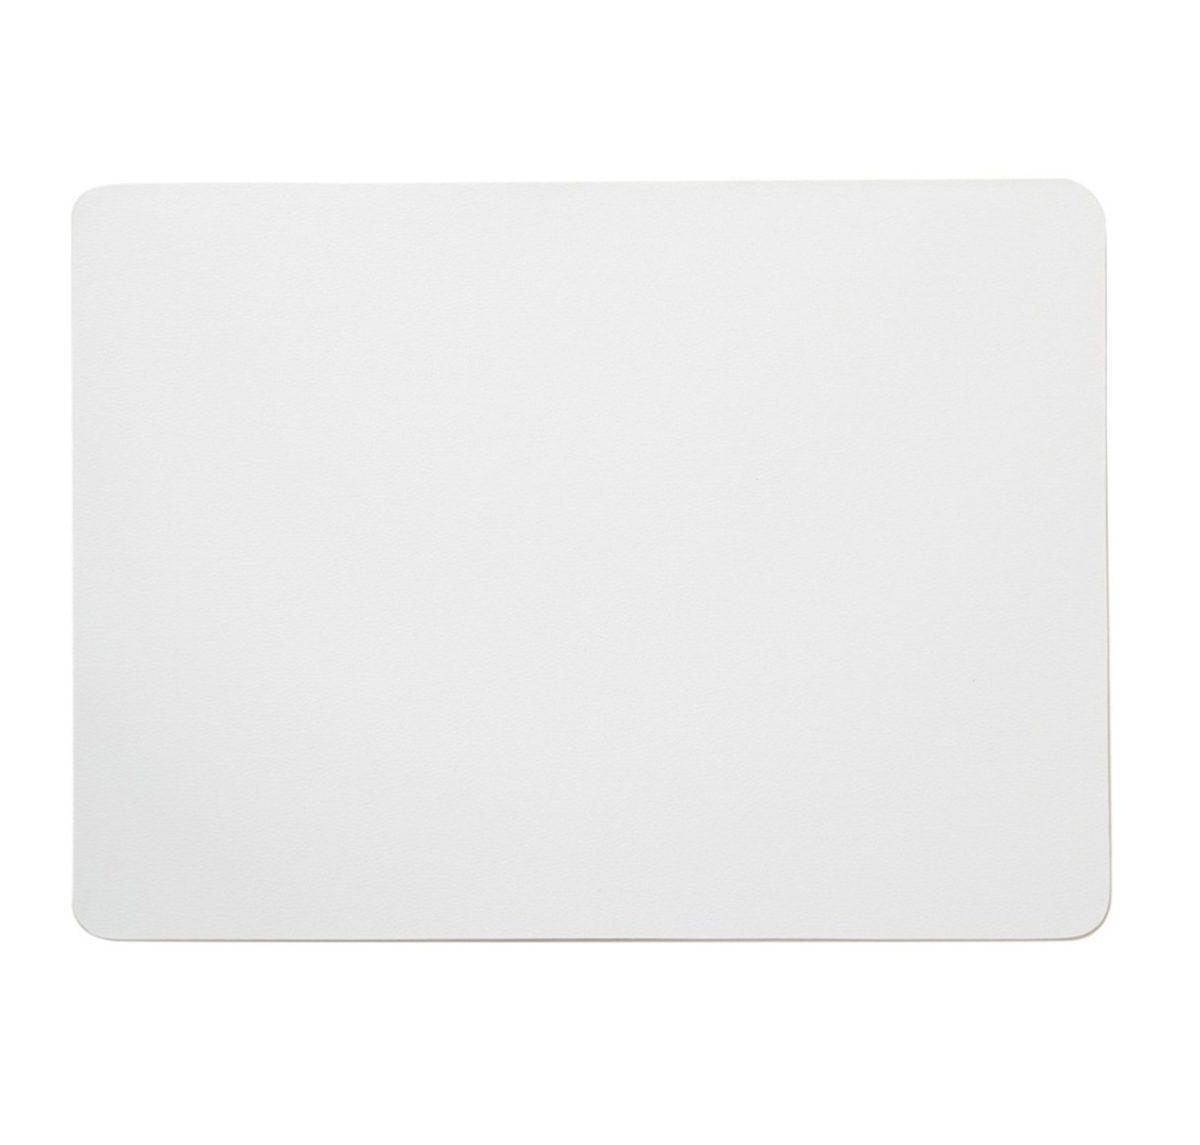 schermafbeelding 2019 10 19 om 12.24.31 1 1200x1145 - Placemat Leather optic fine white 46*33 cm (7800420)